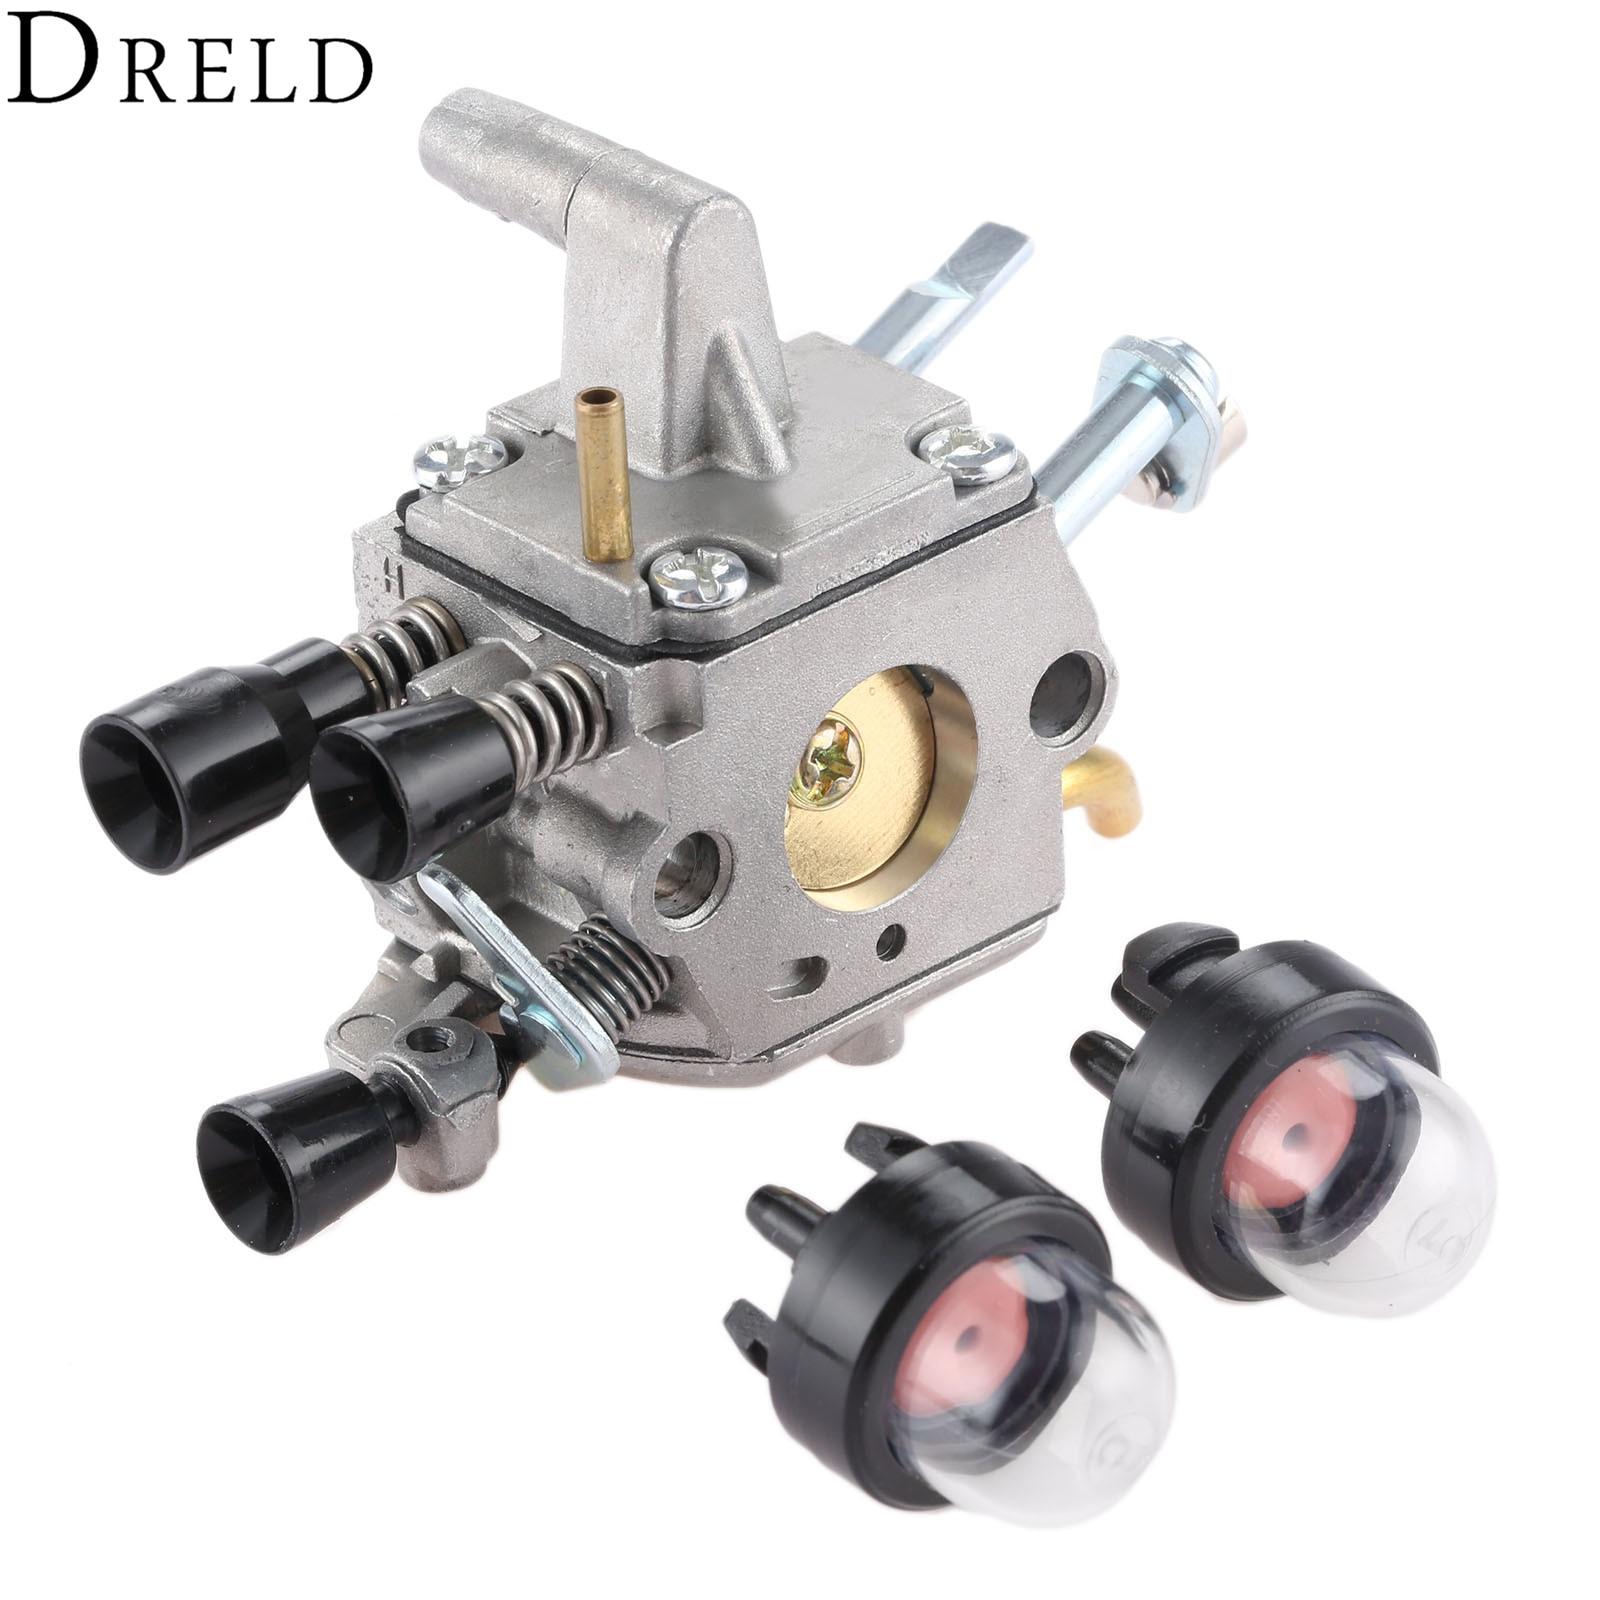 DRELD Carburetor Carb For STIHL FS400 FS450 FS480 BRUSH CUTTER BLOWERS CRAFTSMAN TRIMMER #4128 120 0607/0651 ZAMA C1Q-S154